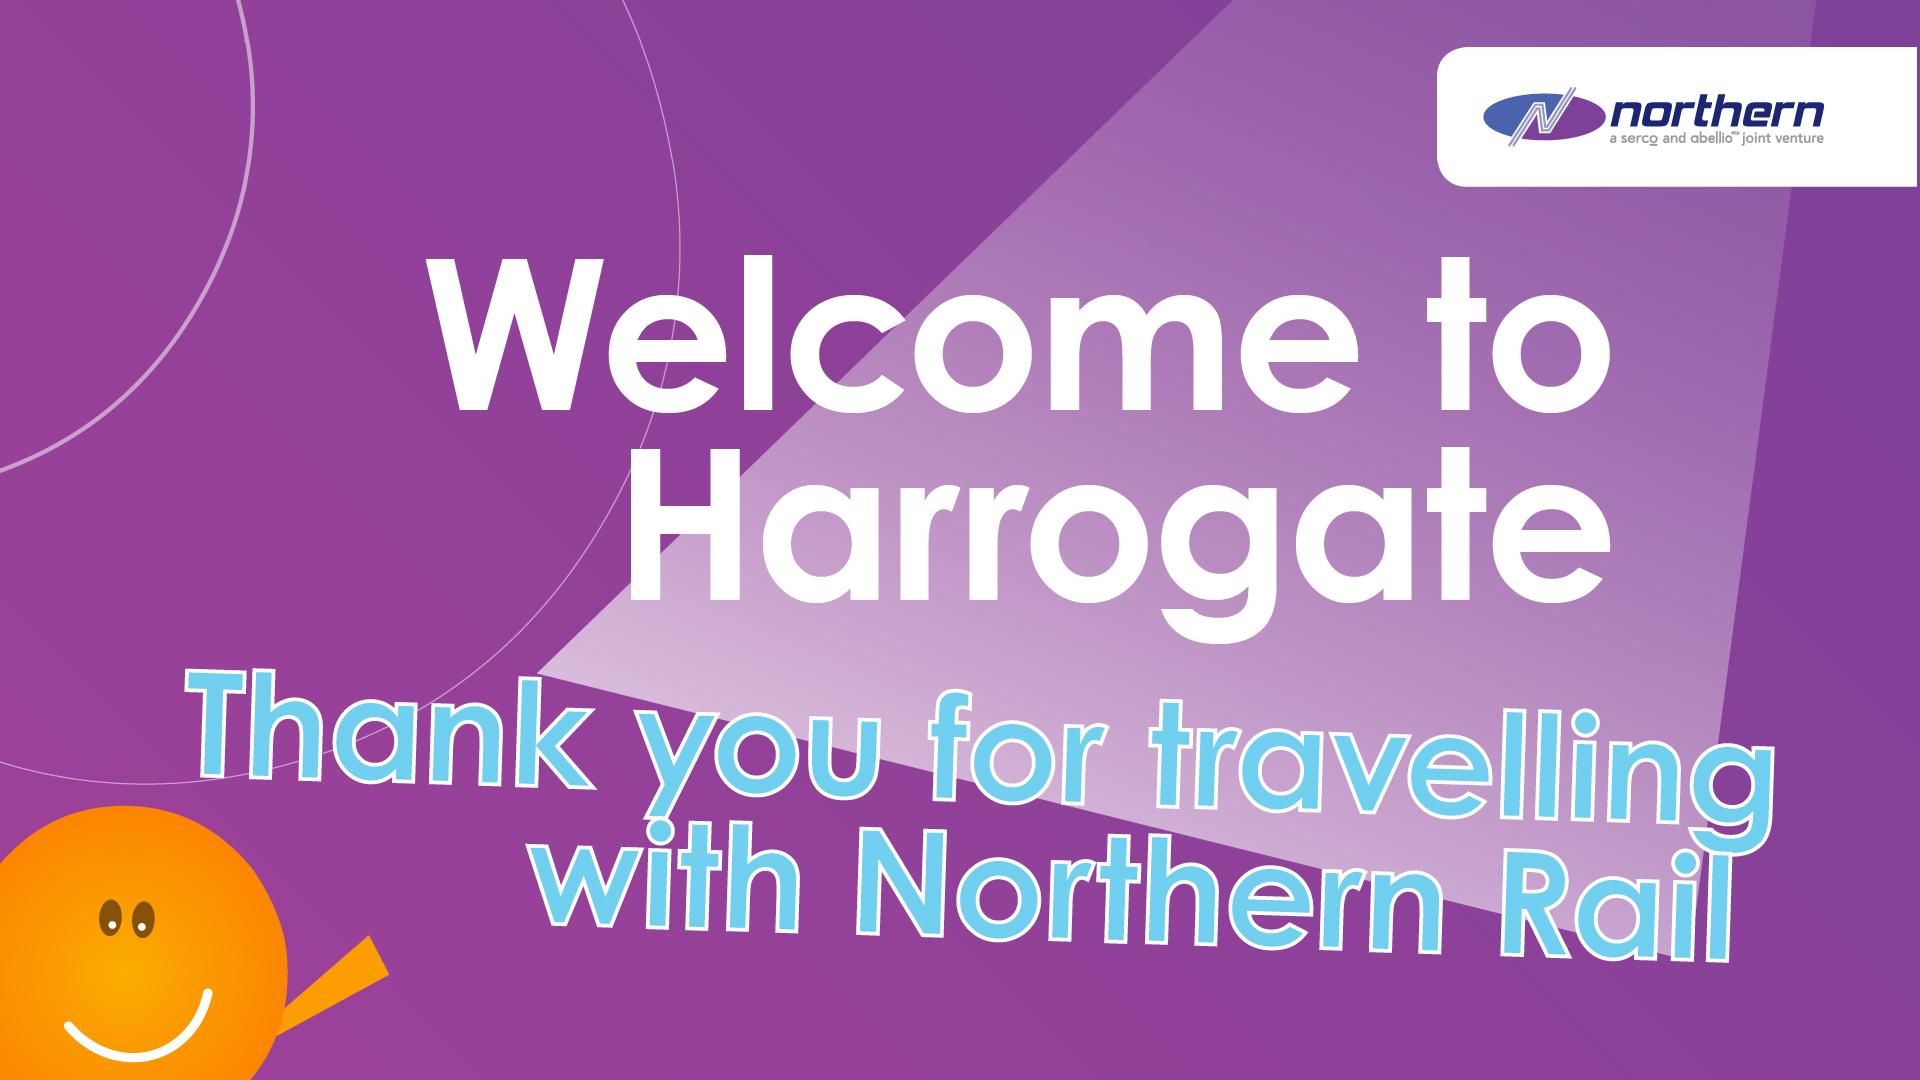 Harrogate-large screen-reverse-welcome_3 (2)